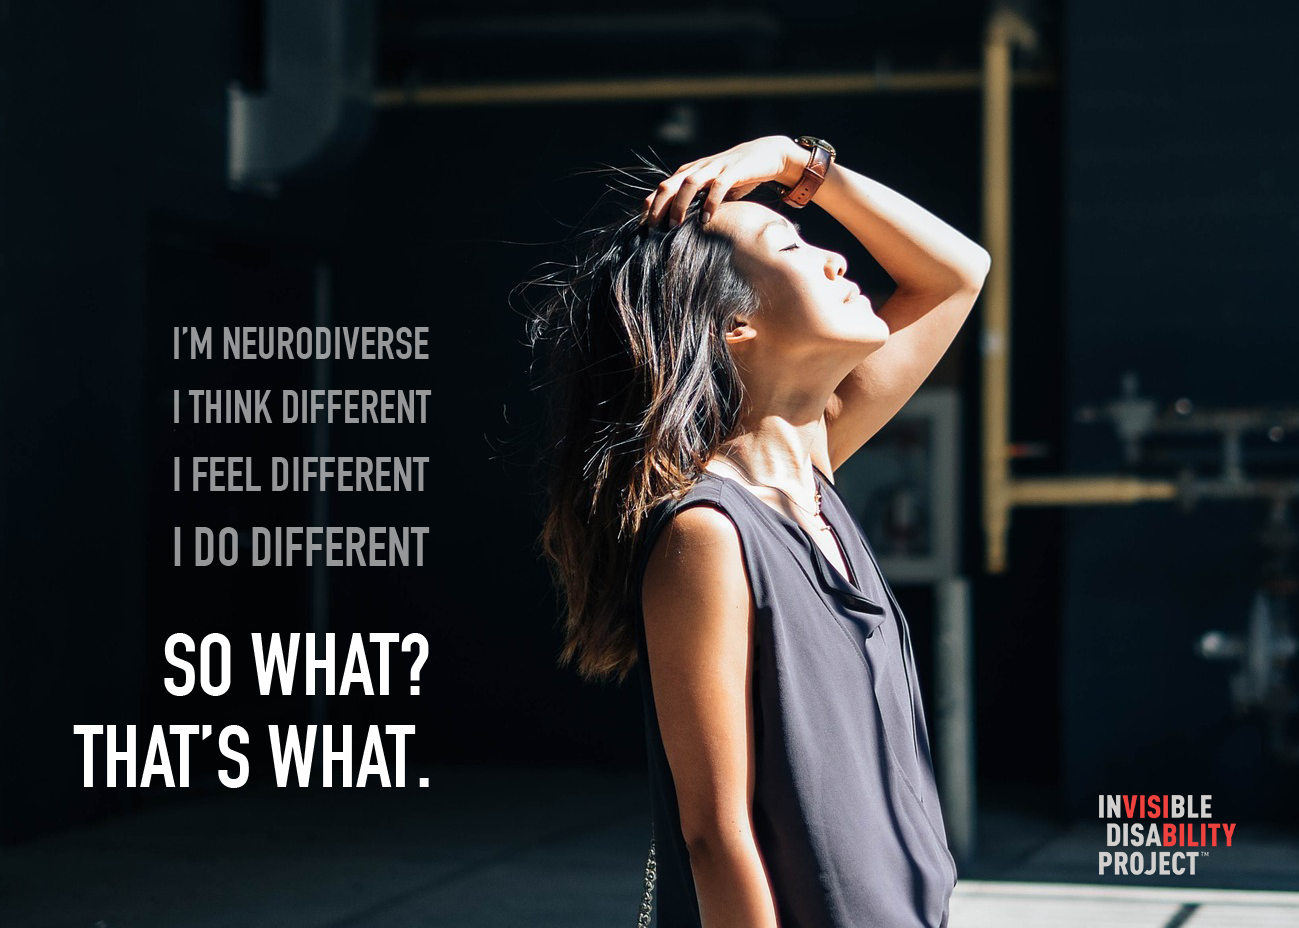 I'm neurodiverse. I think different. I feel different. I do different. So what? That's what.